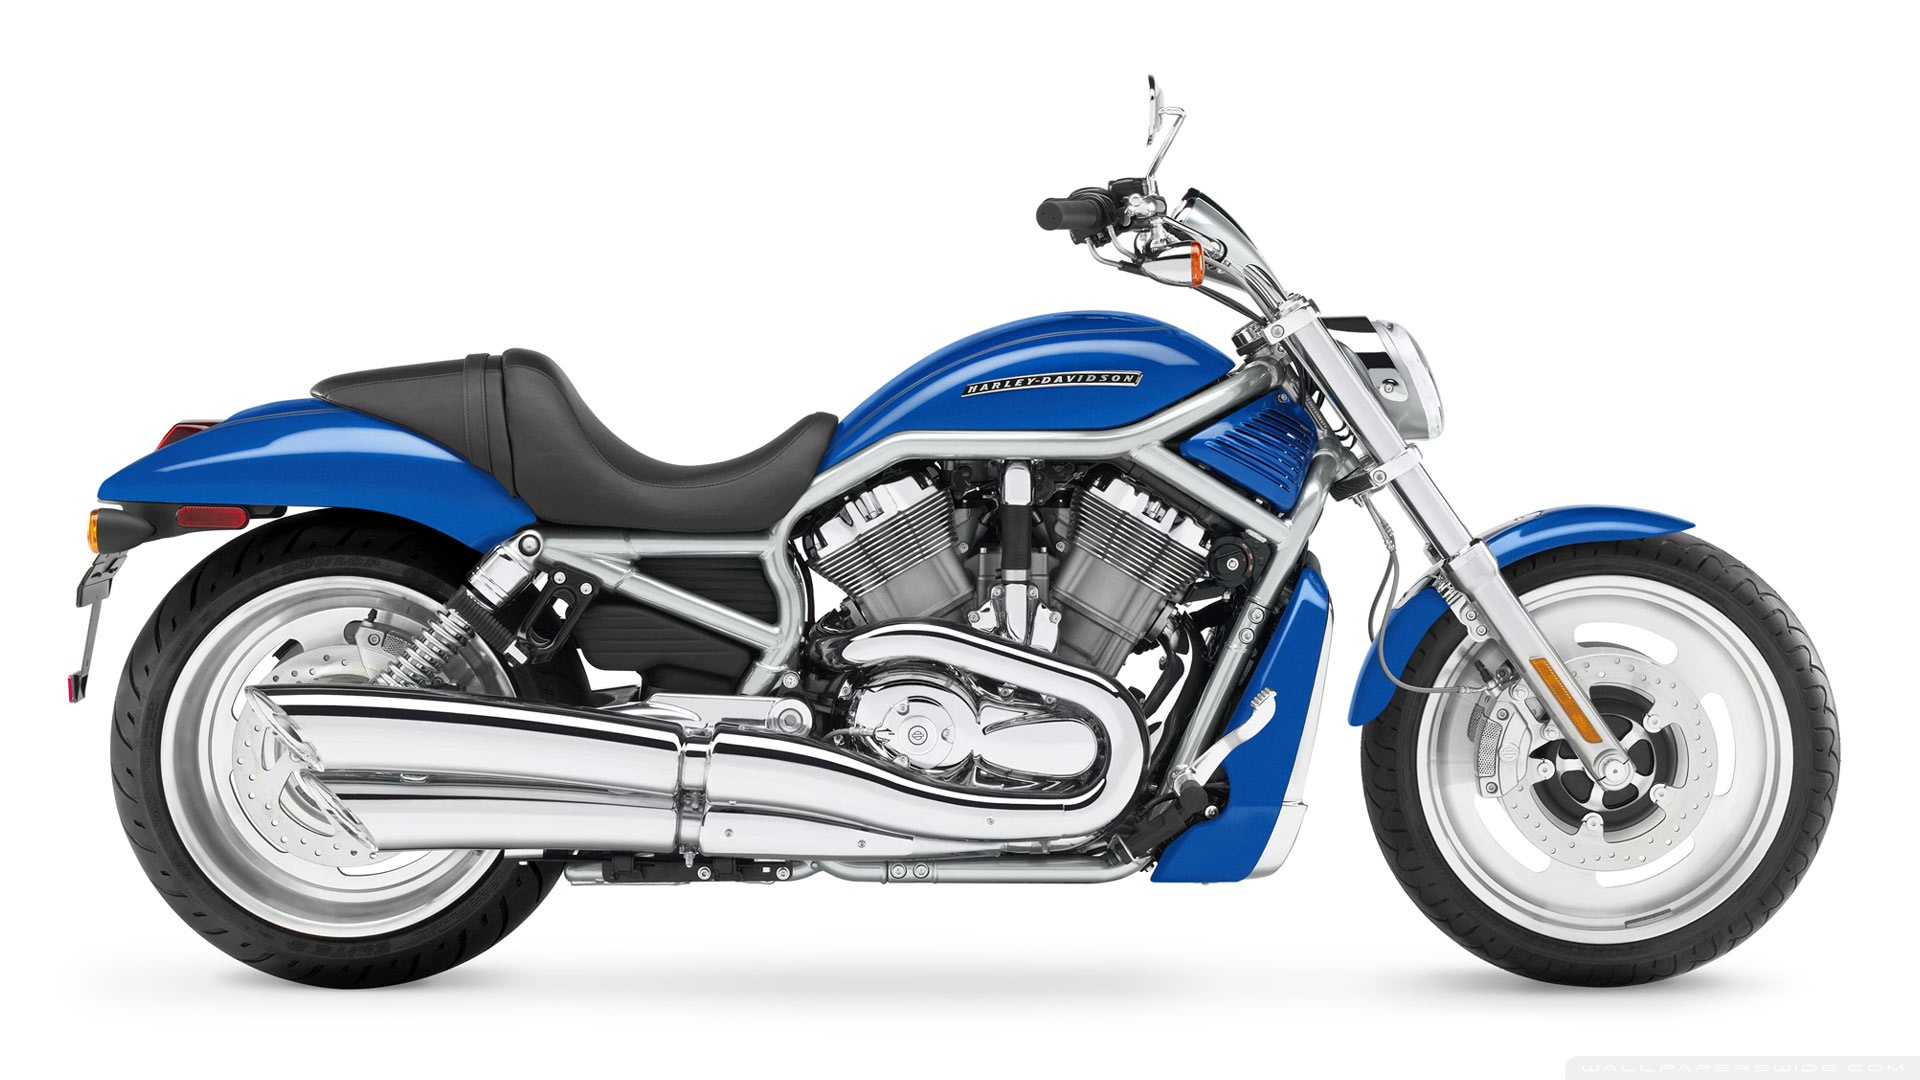 Harley Davidson V Rod Hd Wallpaper